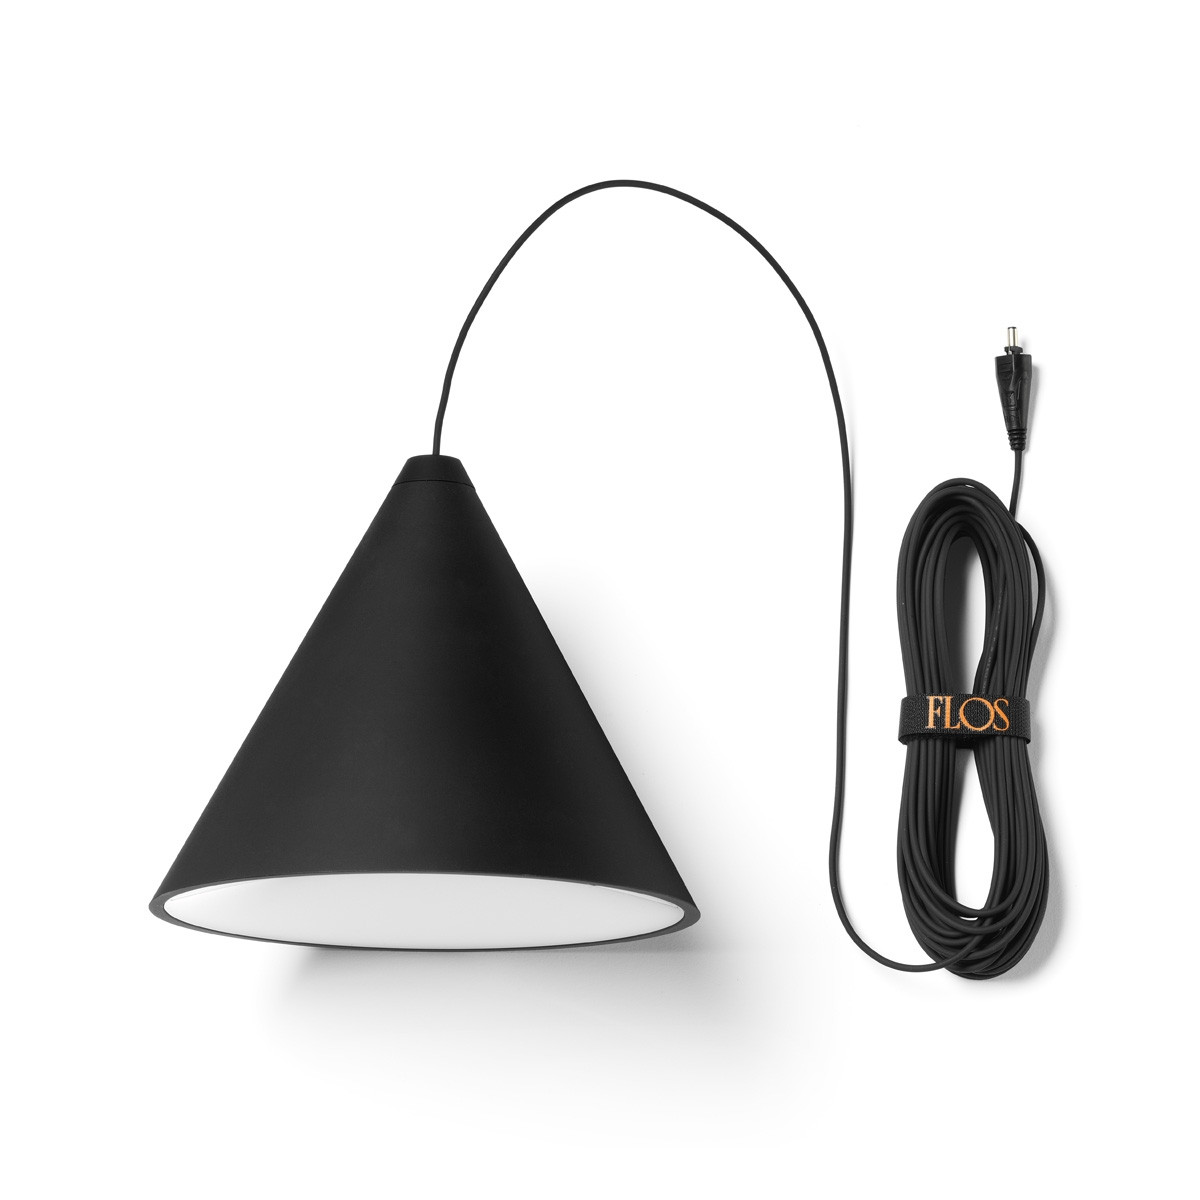 Flos Cone String Pendant Light